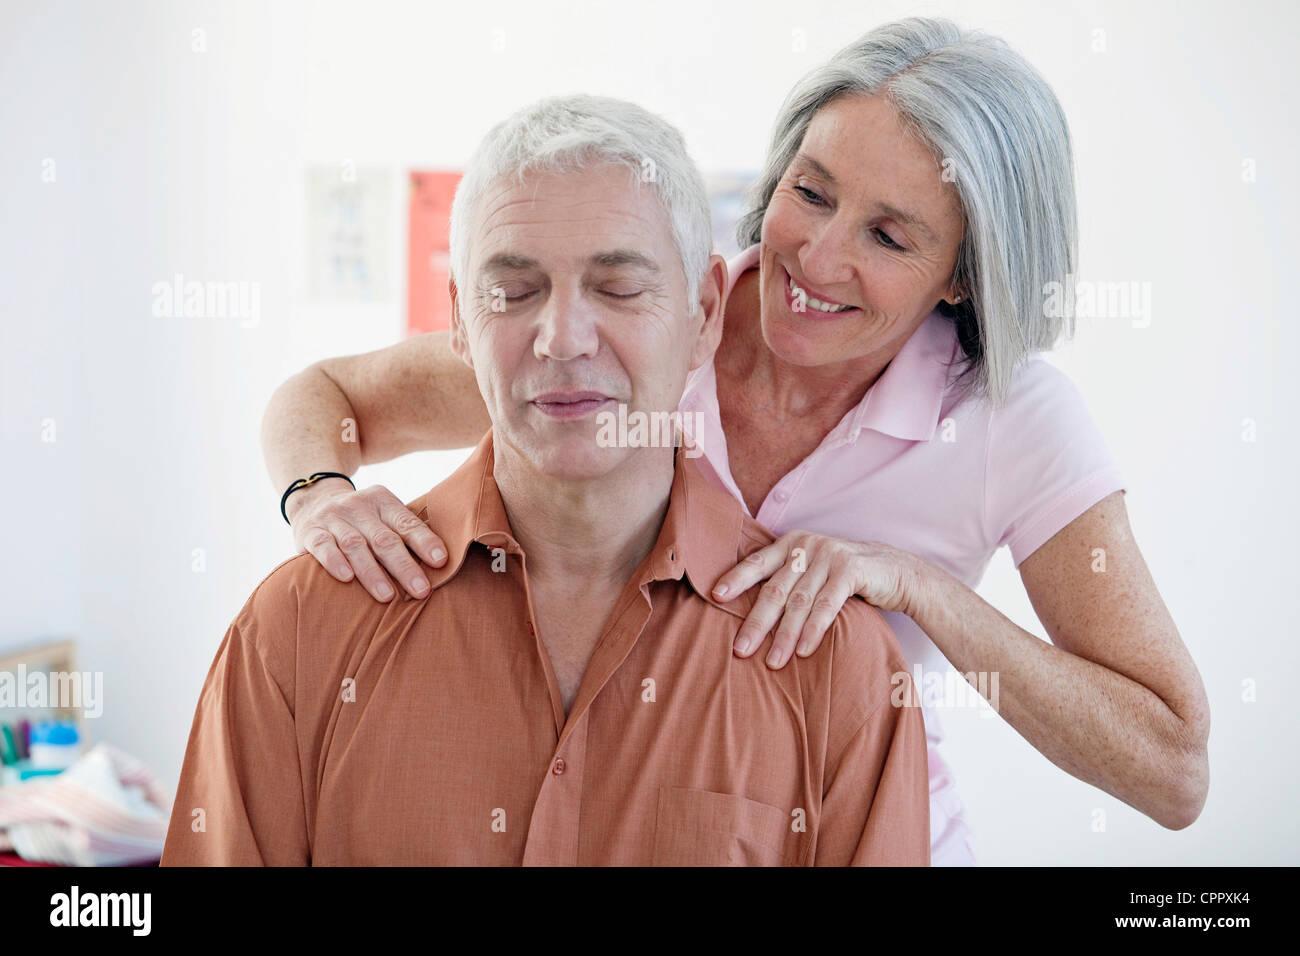 ELDERLY PERSON BEING MASSAGED - Stock Image